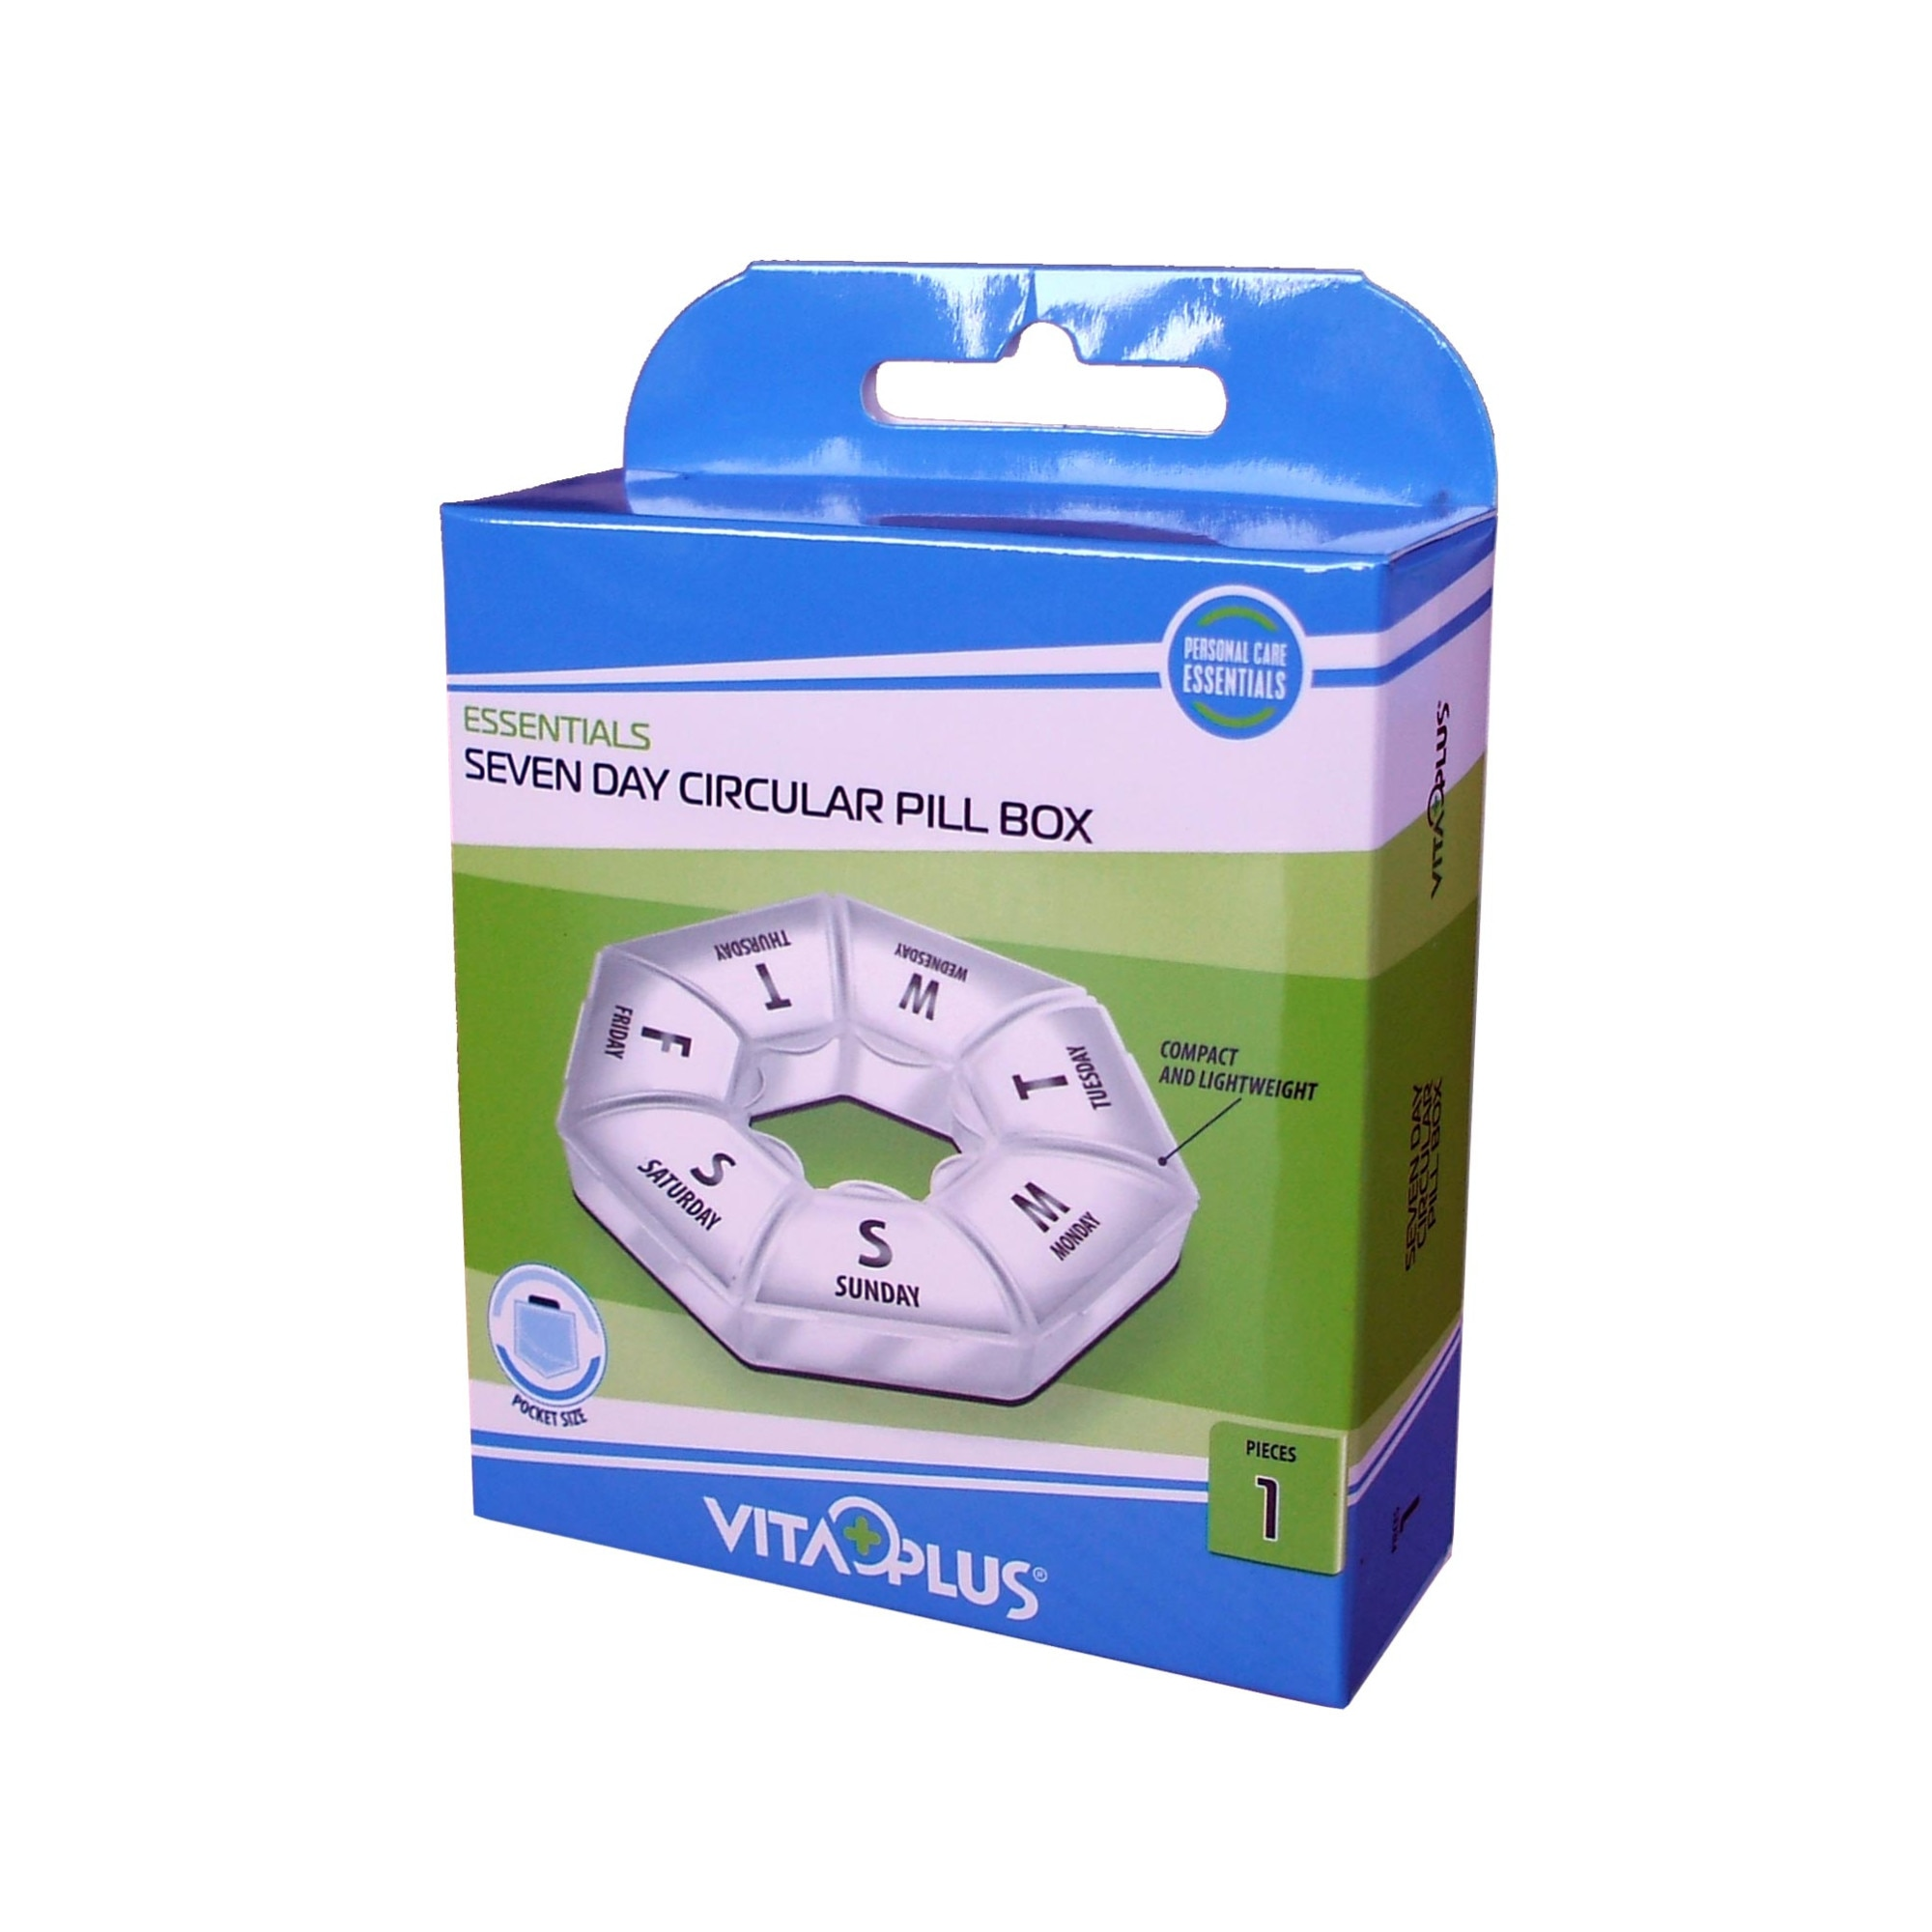 Organizator Saptamanal Pentru Medicamente Circular Si Compact Emag Ro